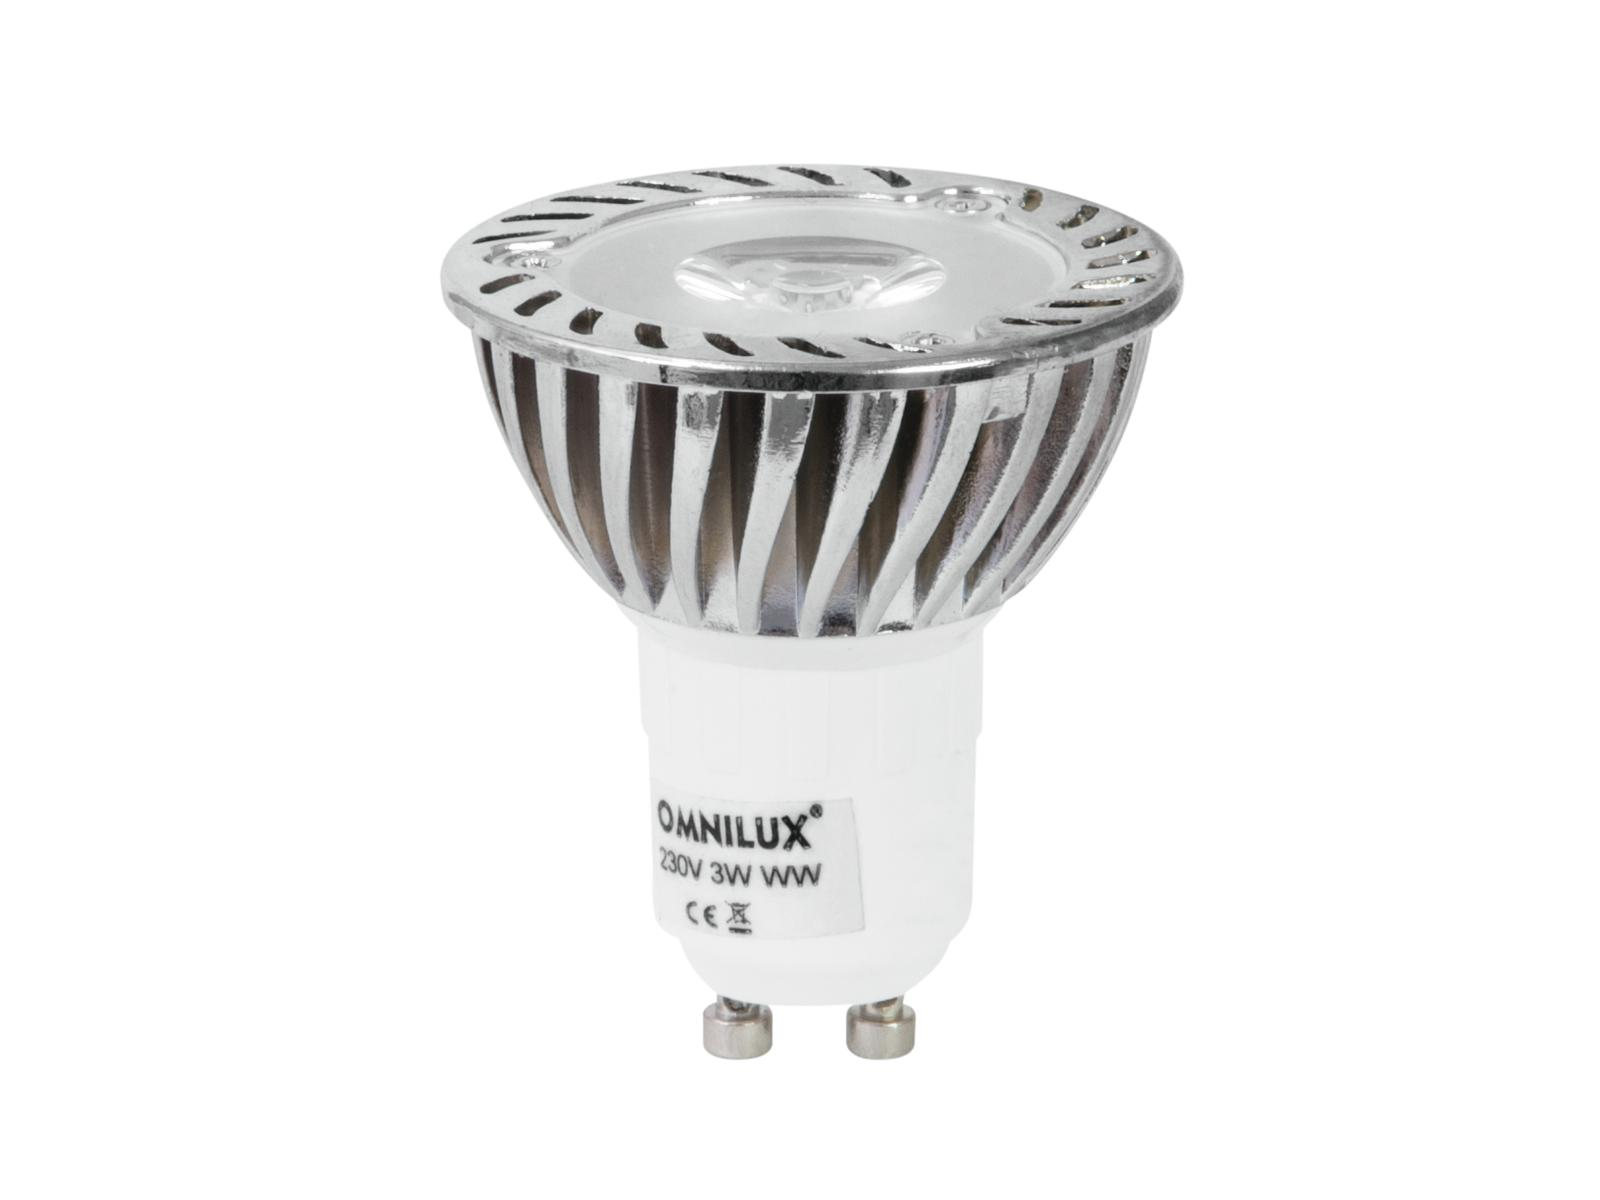 230V GU-10 3W LED Omnilux, 3000K, sv. zdroj